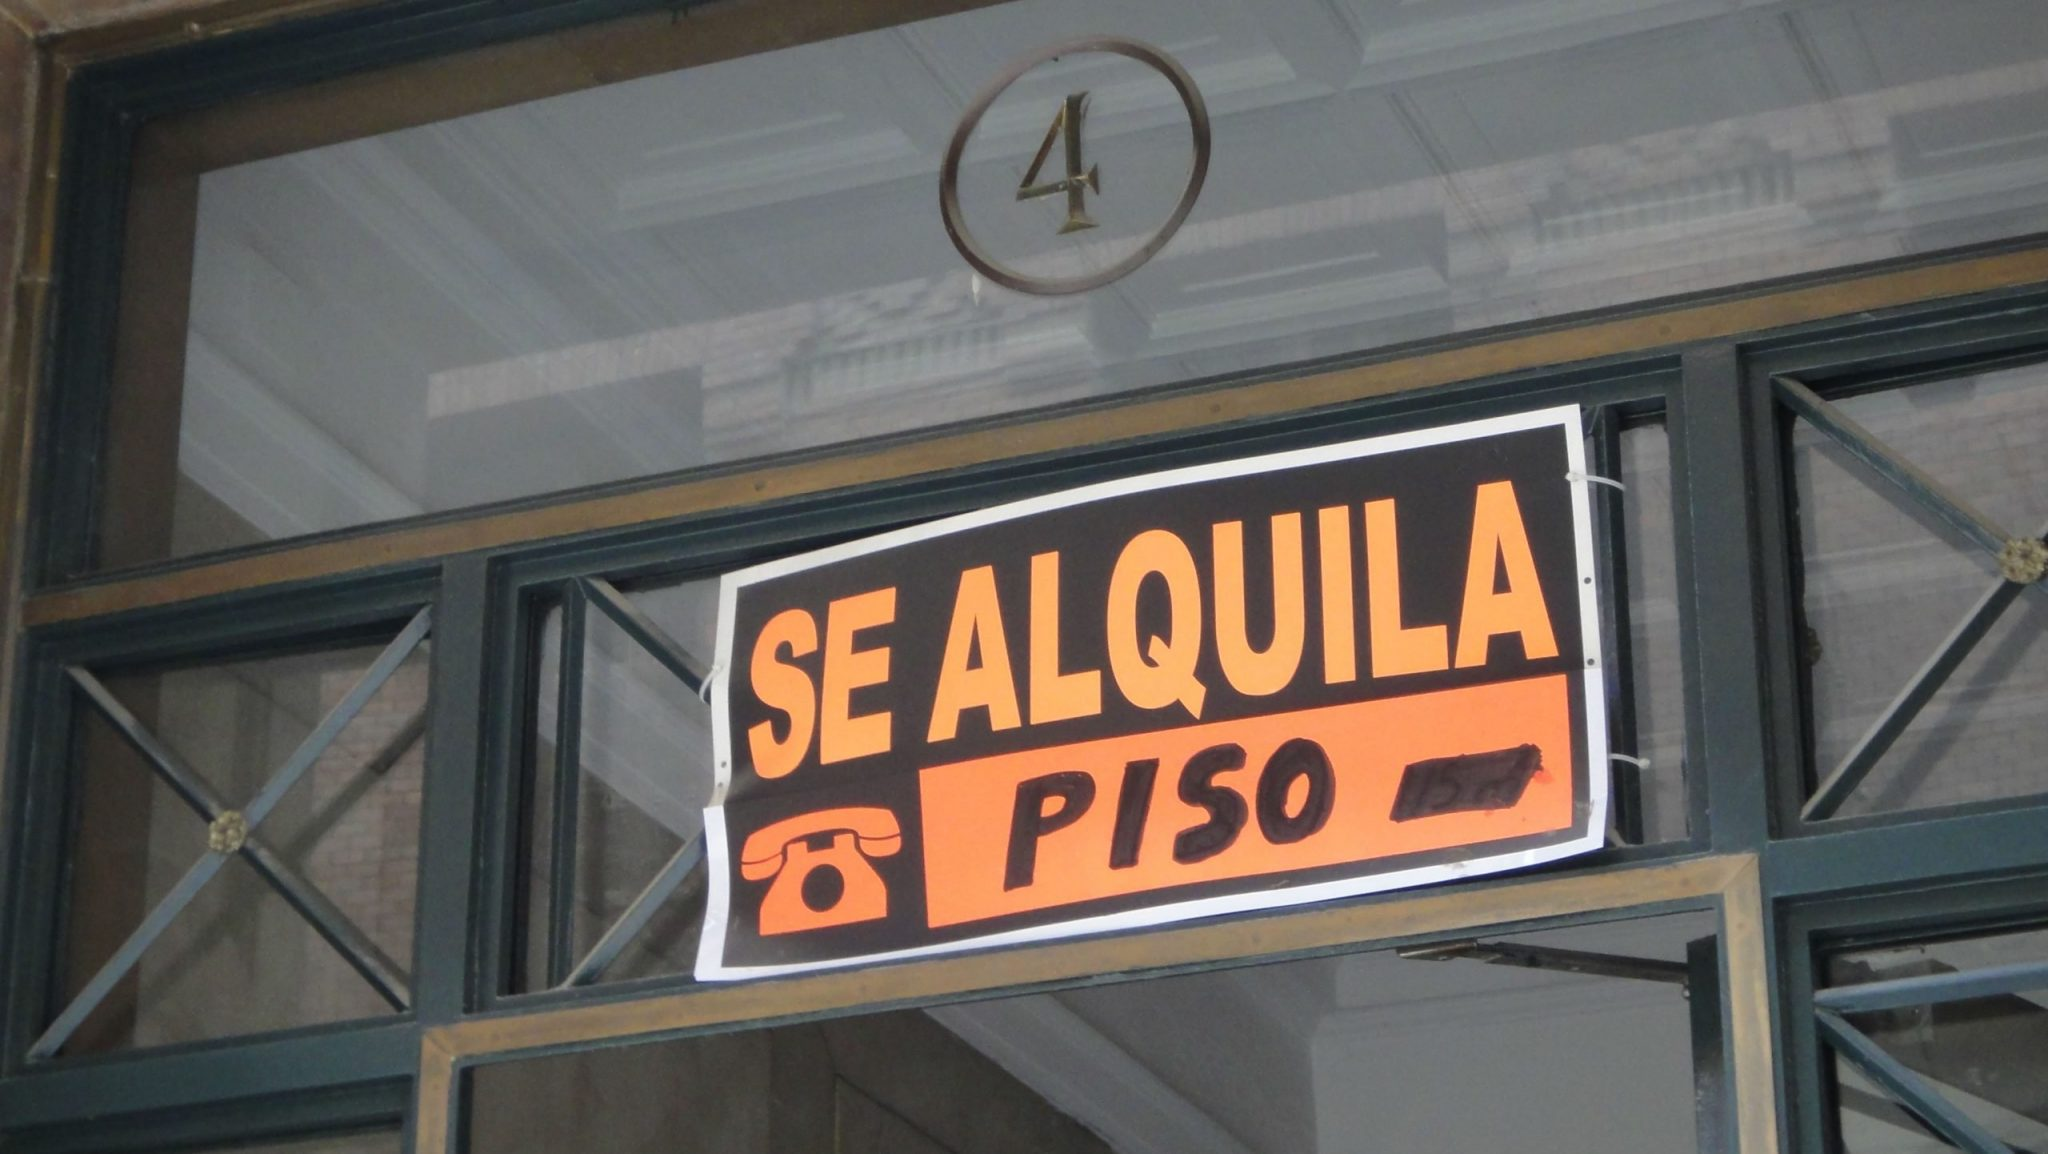 Source: capl@washjeff.edu || Apartment for Rent Sign in Spanish